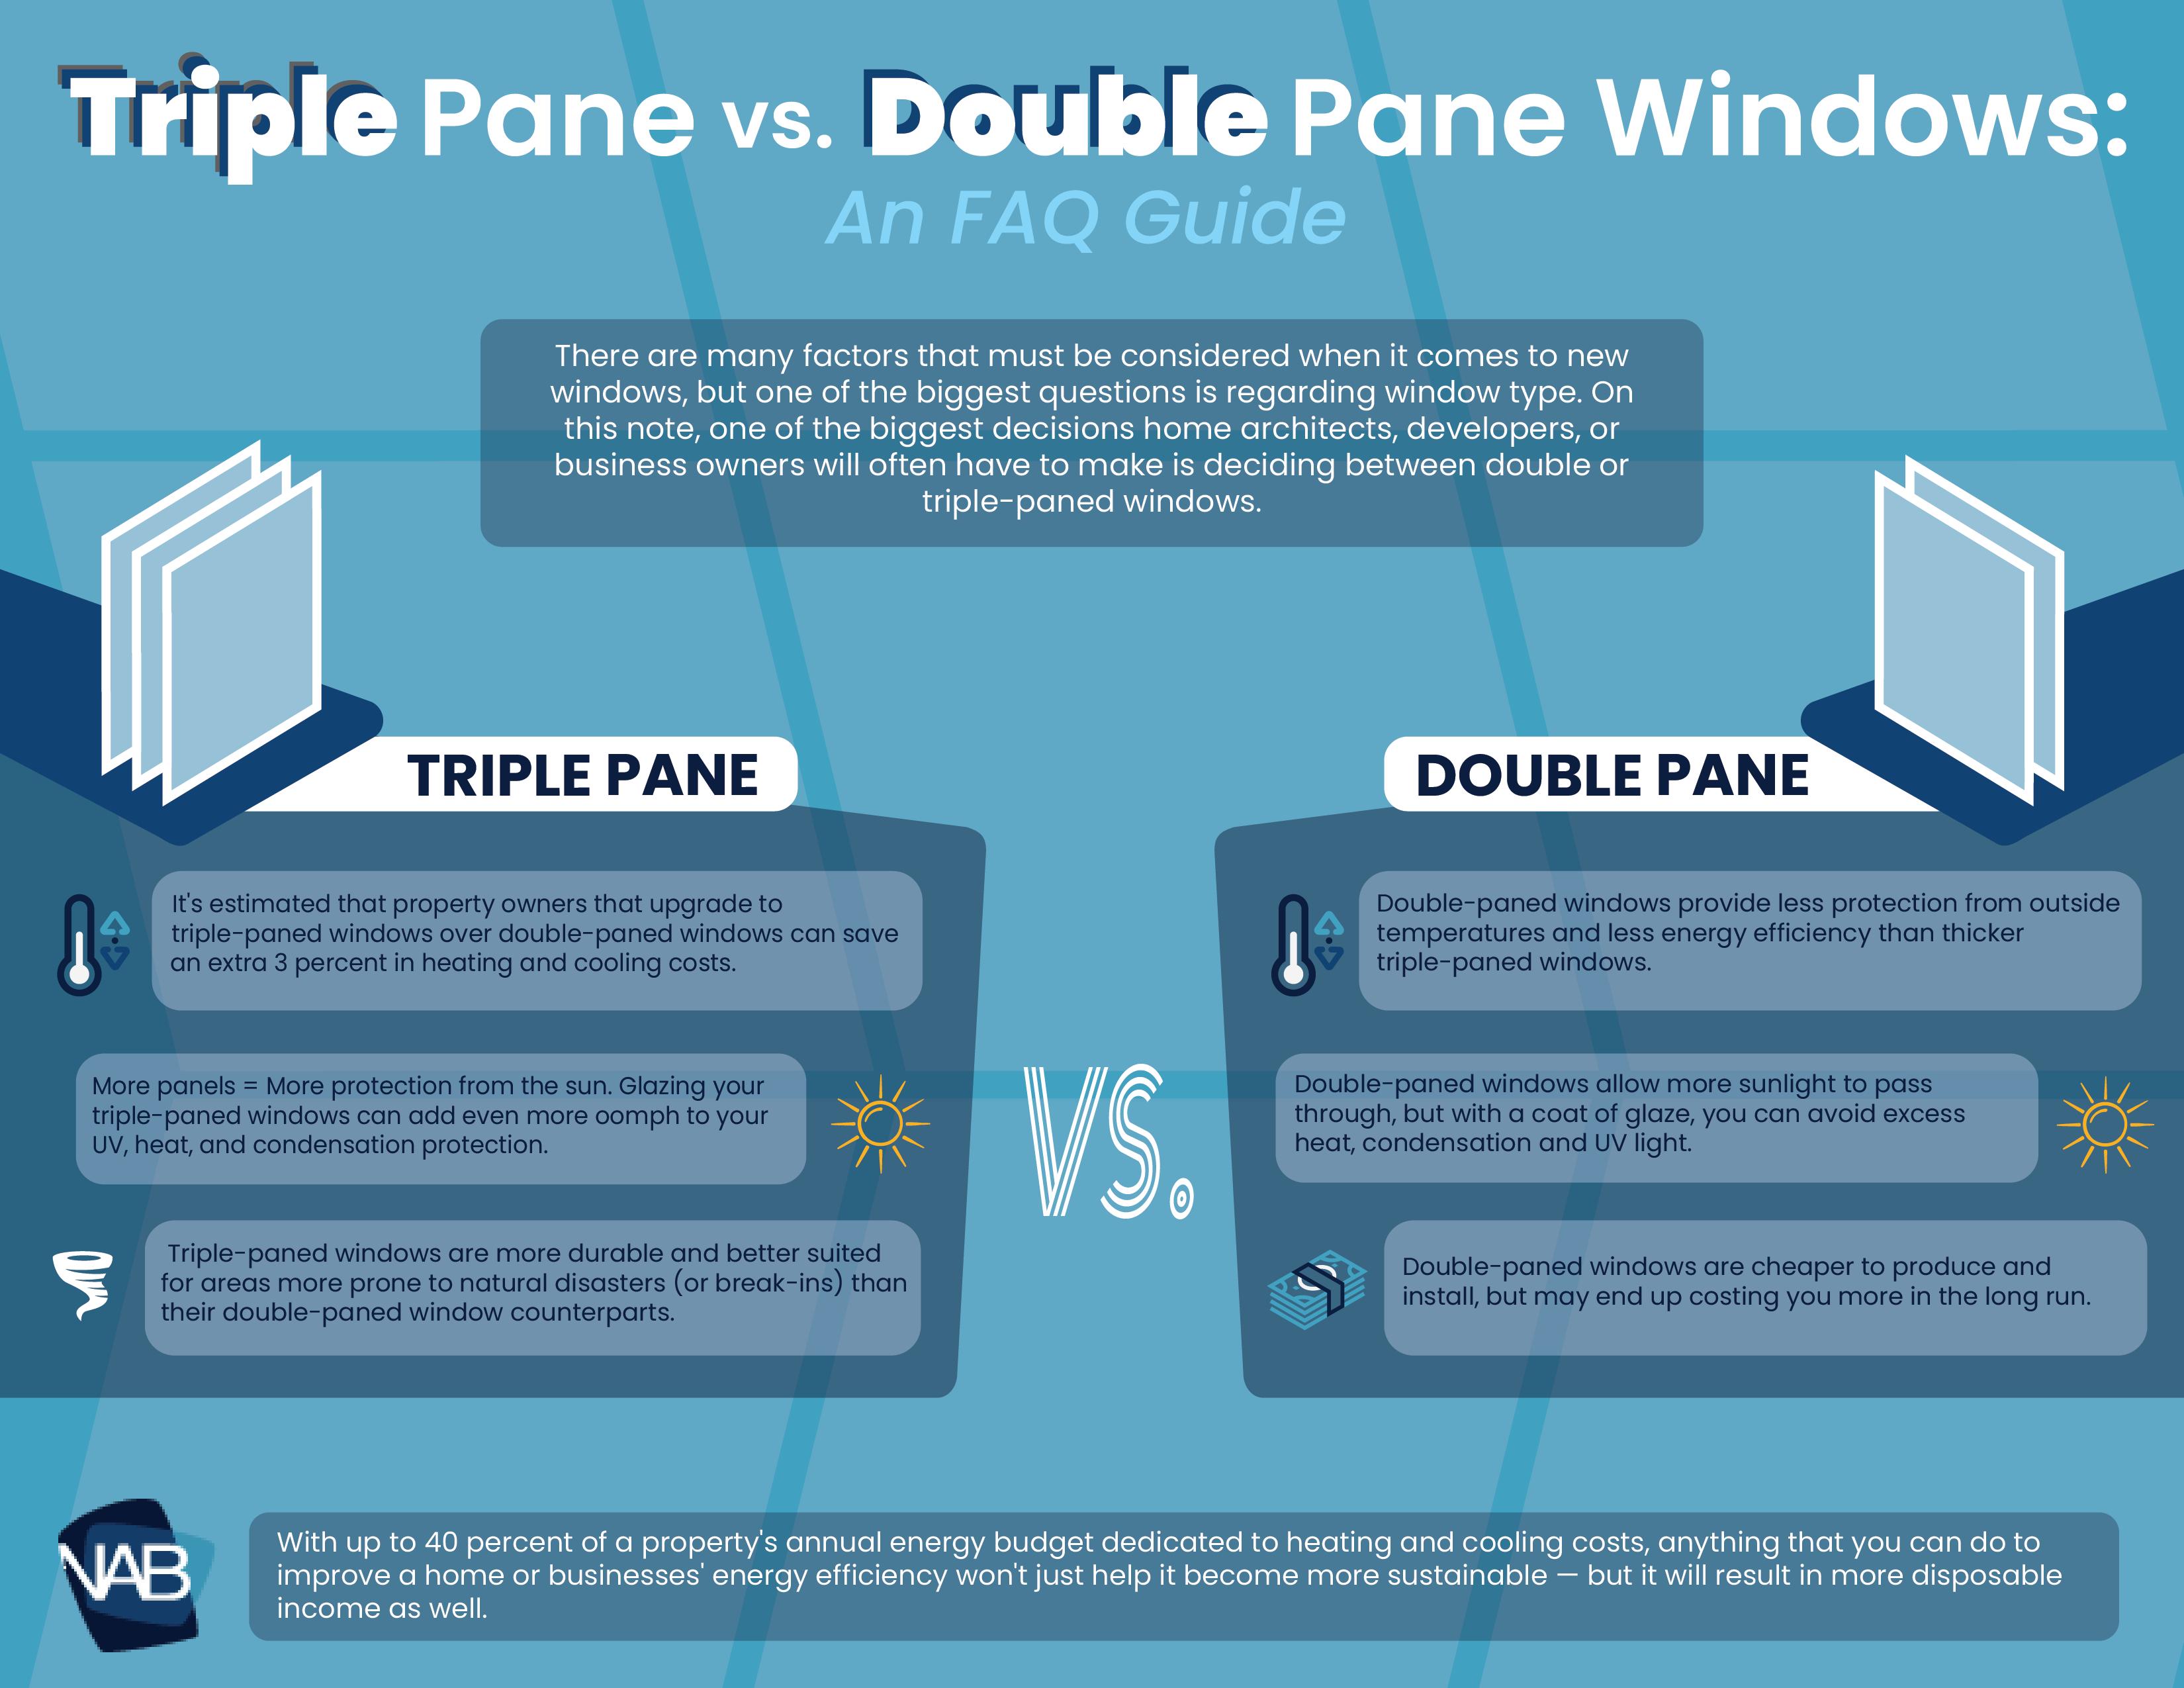 DoubleVTriple Windows (Landscape)